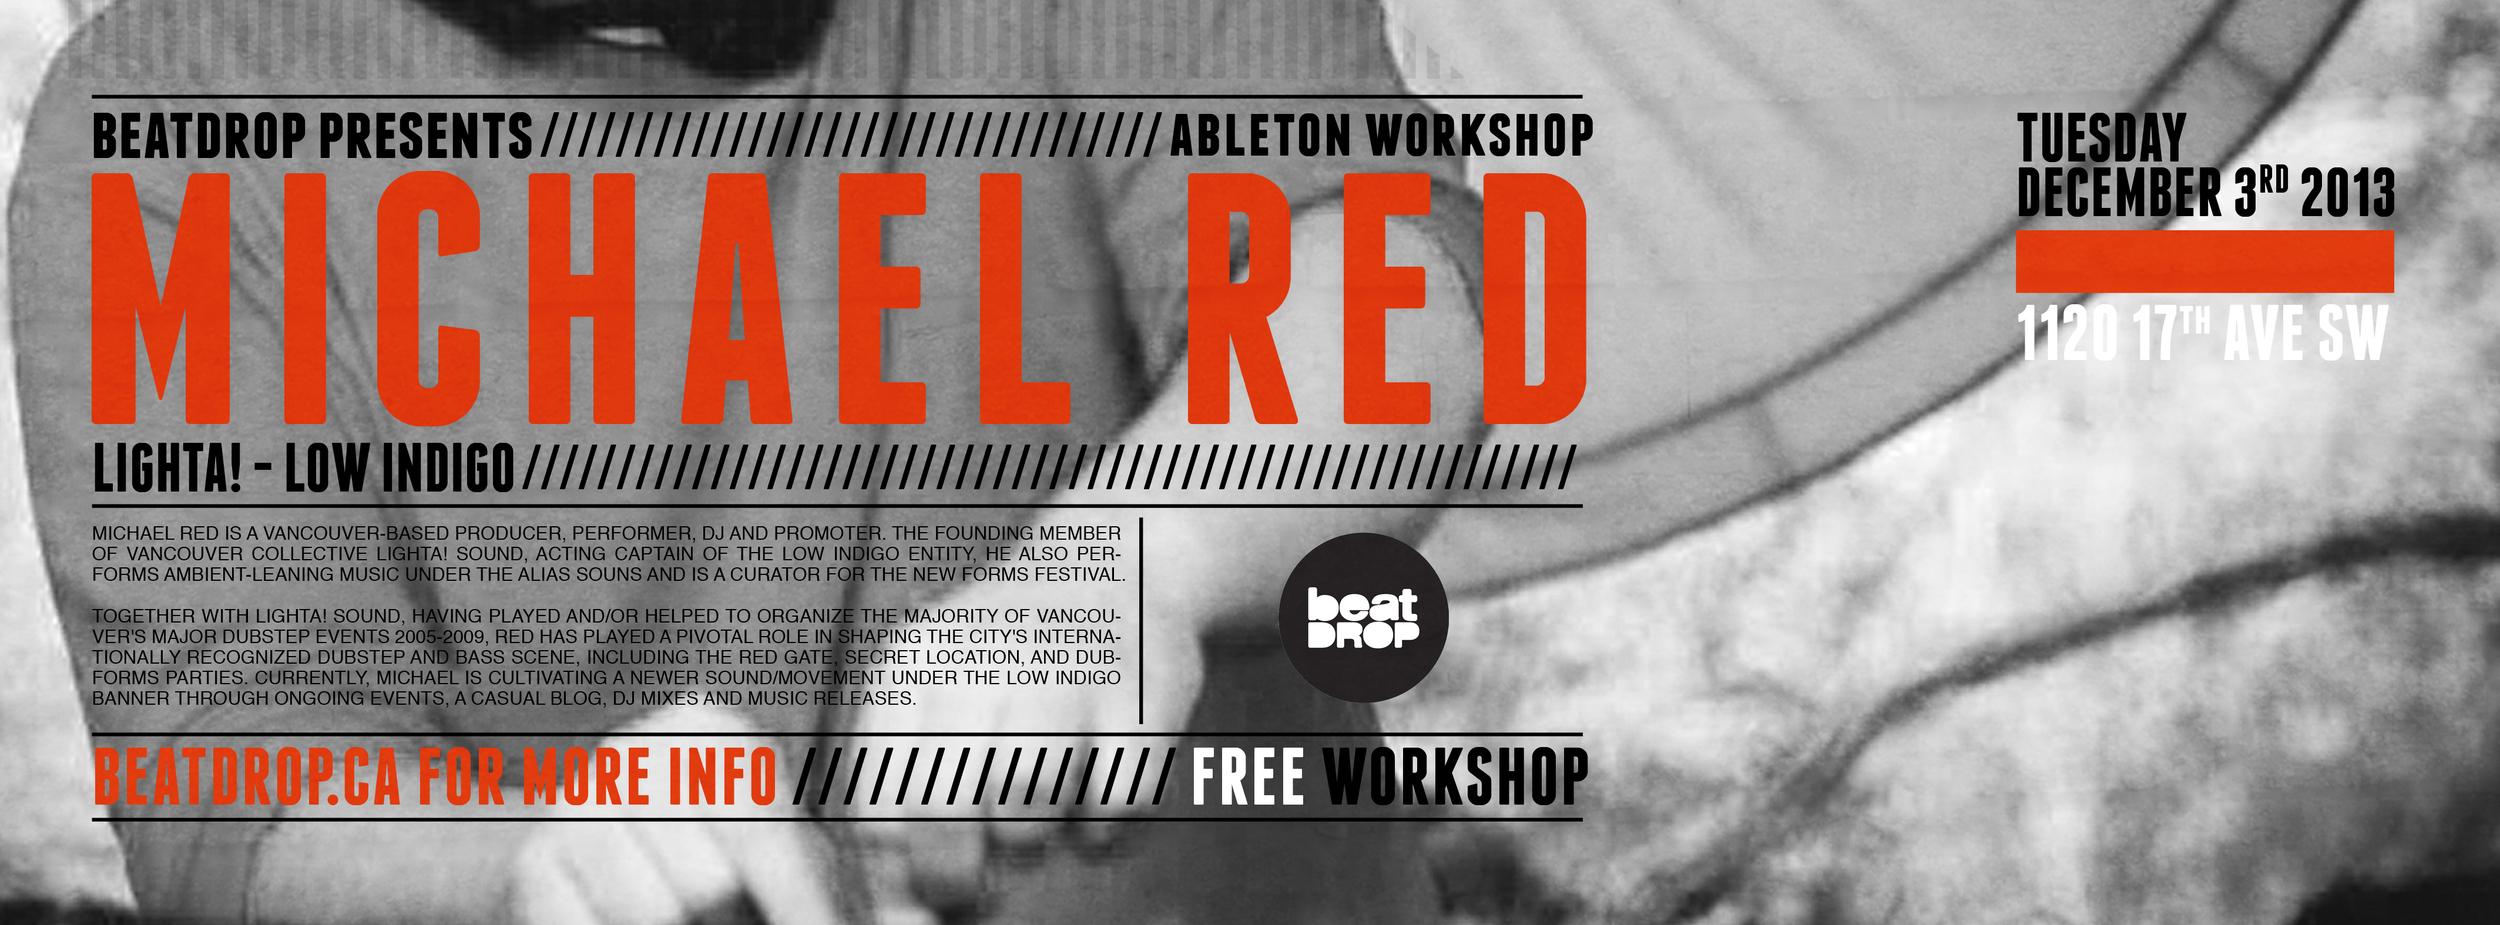 MRed_workshop_fb.jpg